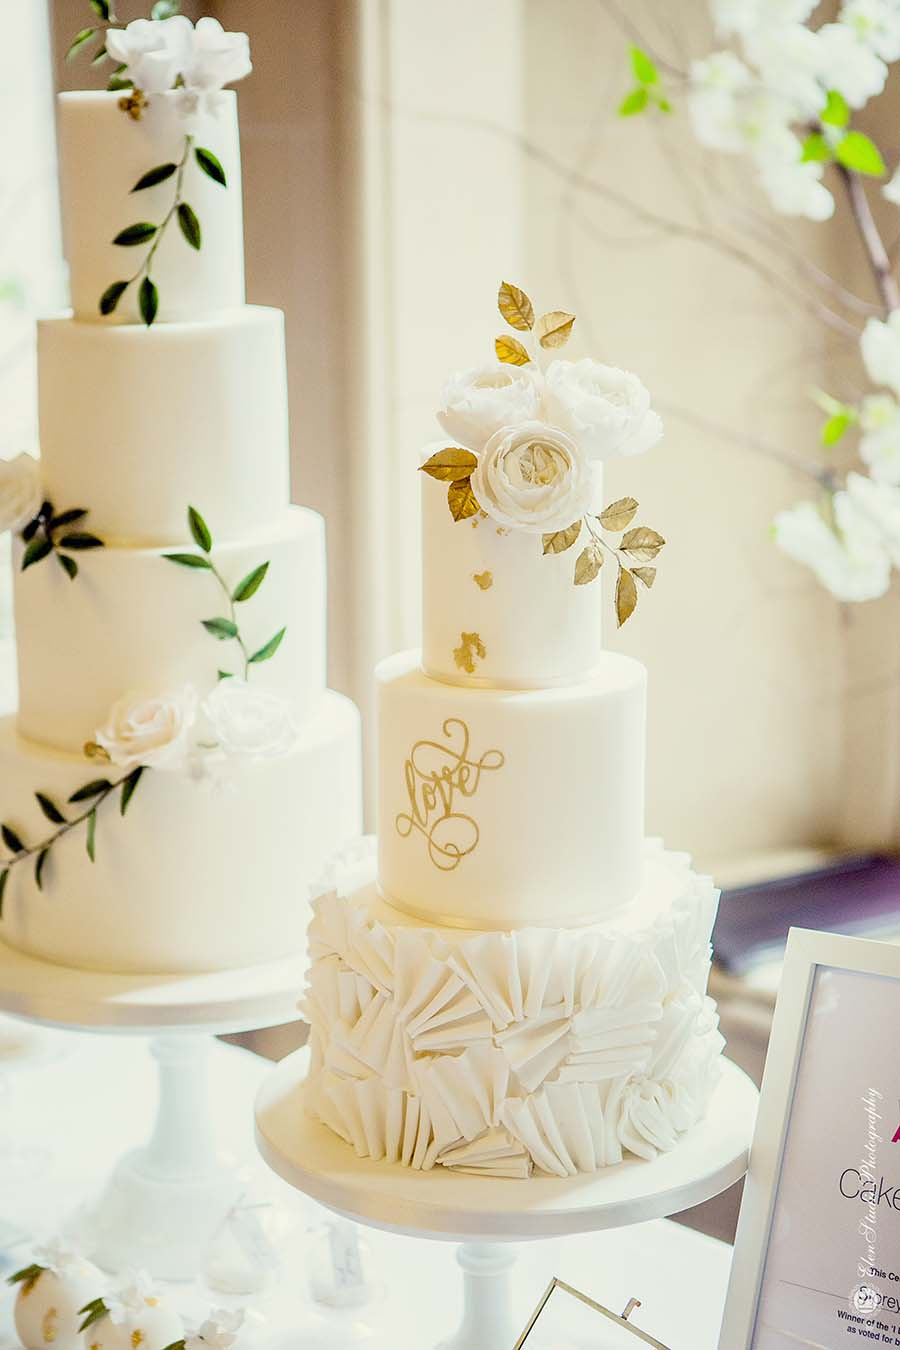 Belvoir-Castle-wedding-fair-Elen-Studio-Photography-006